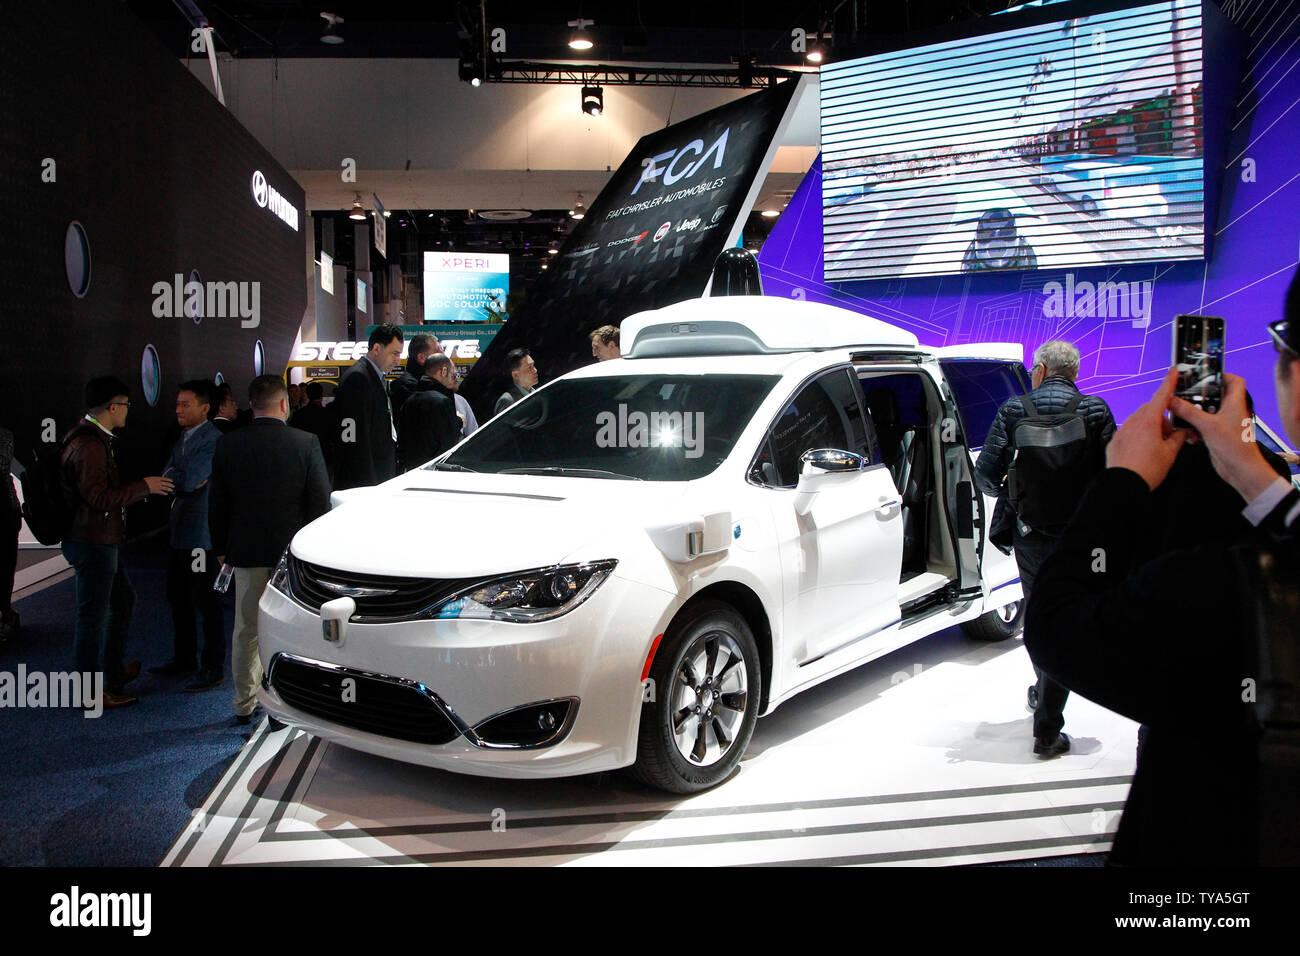 An autonomous self driving Chrysler Pacifica minivan by